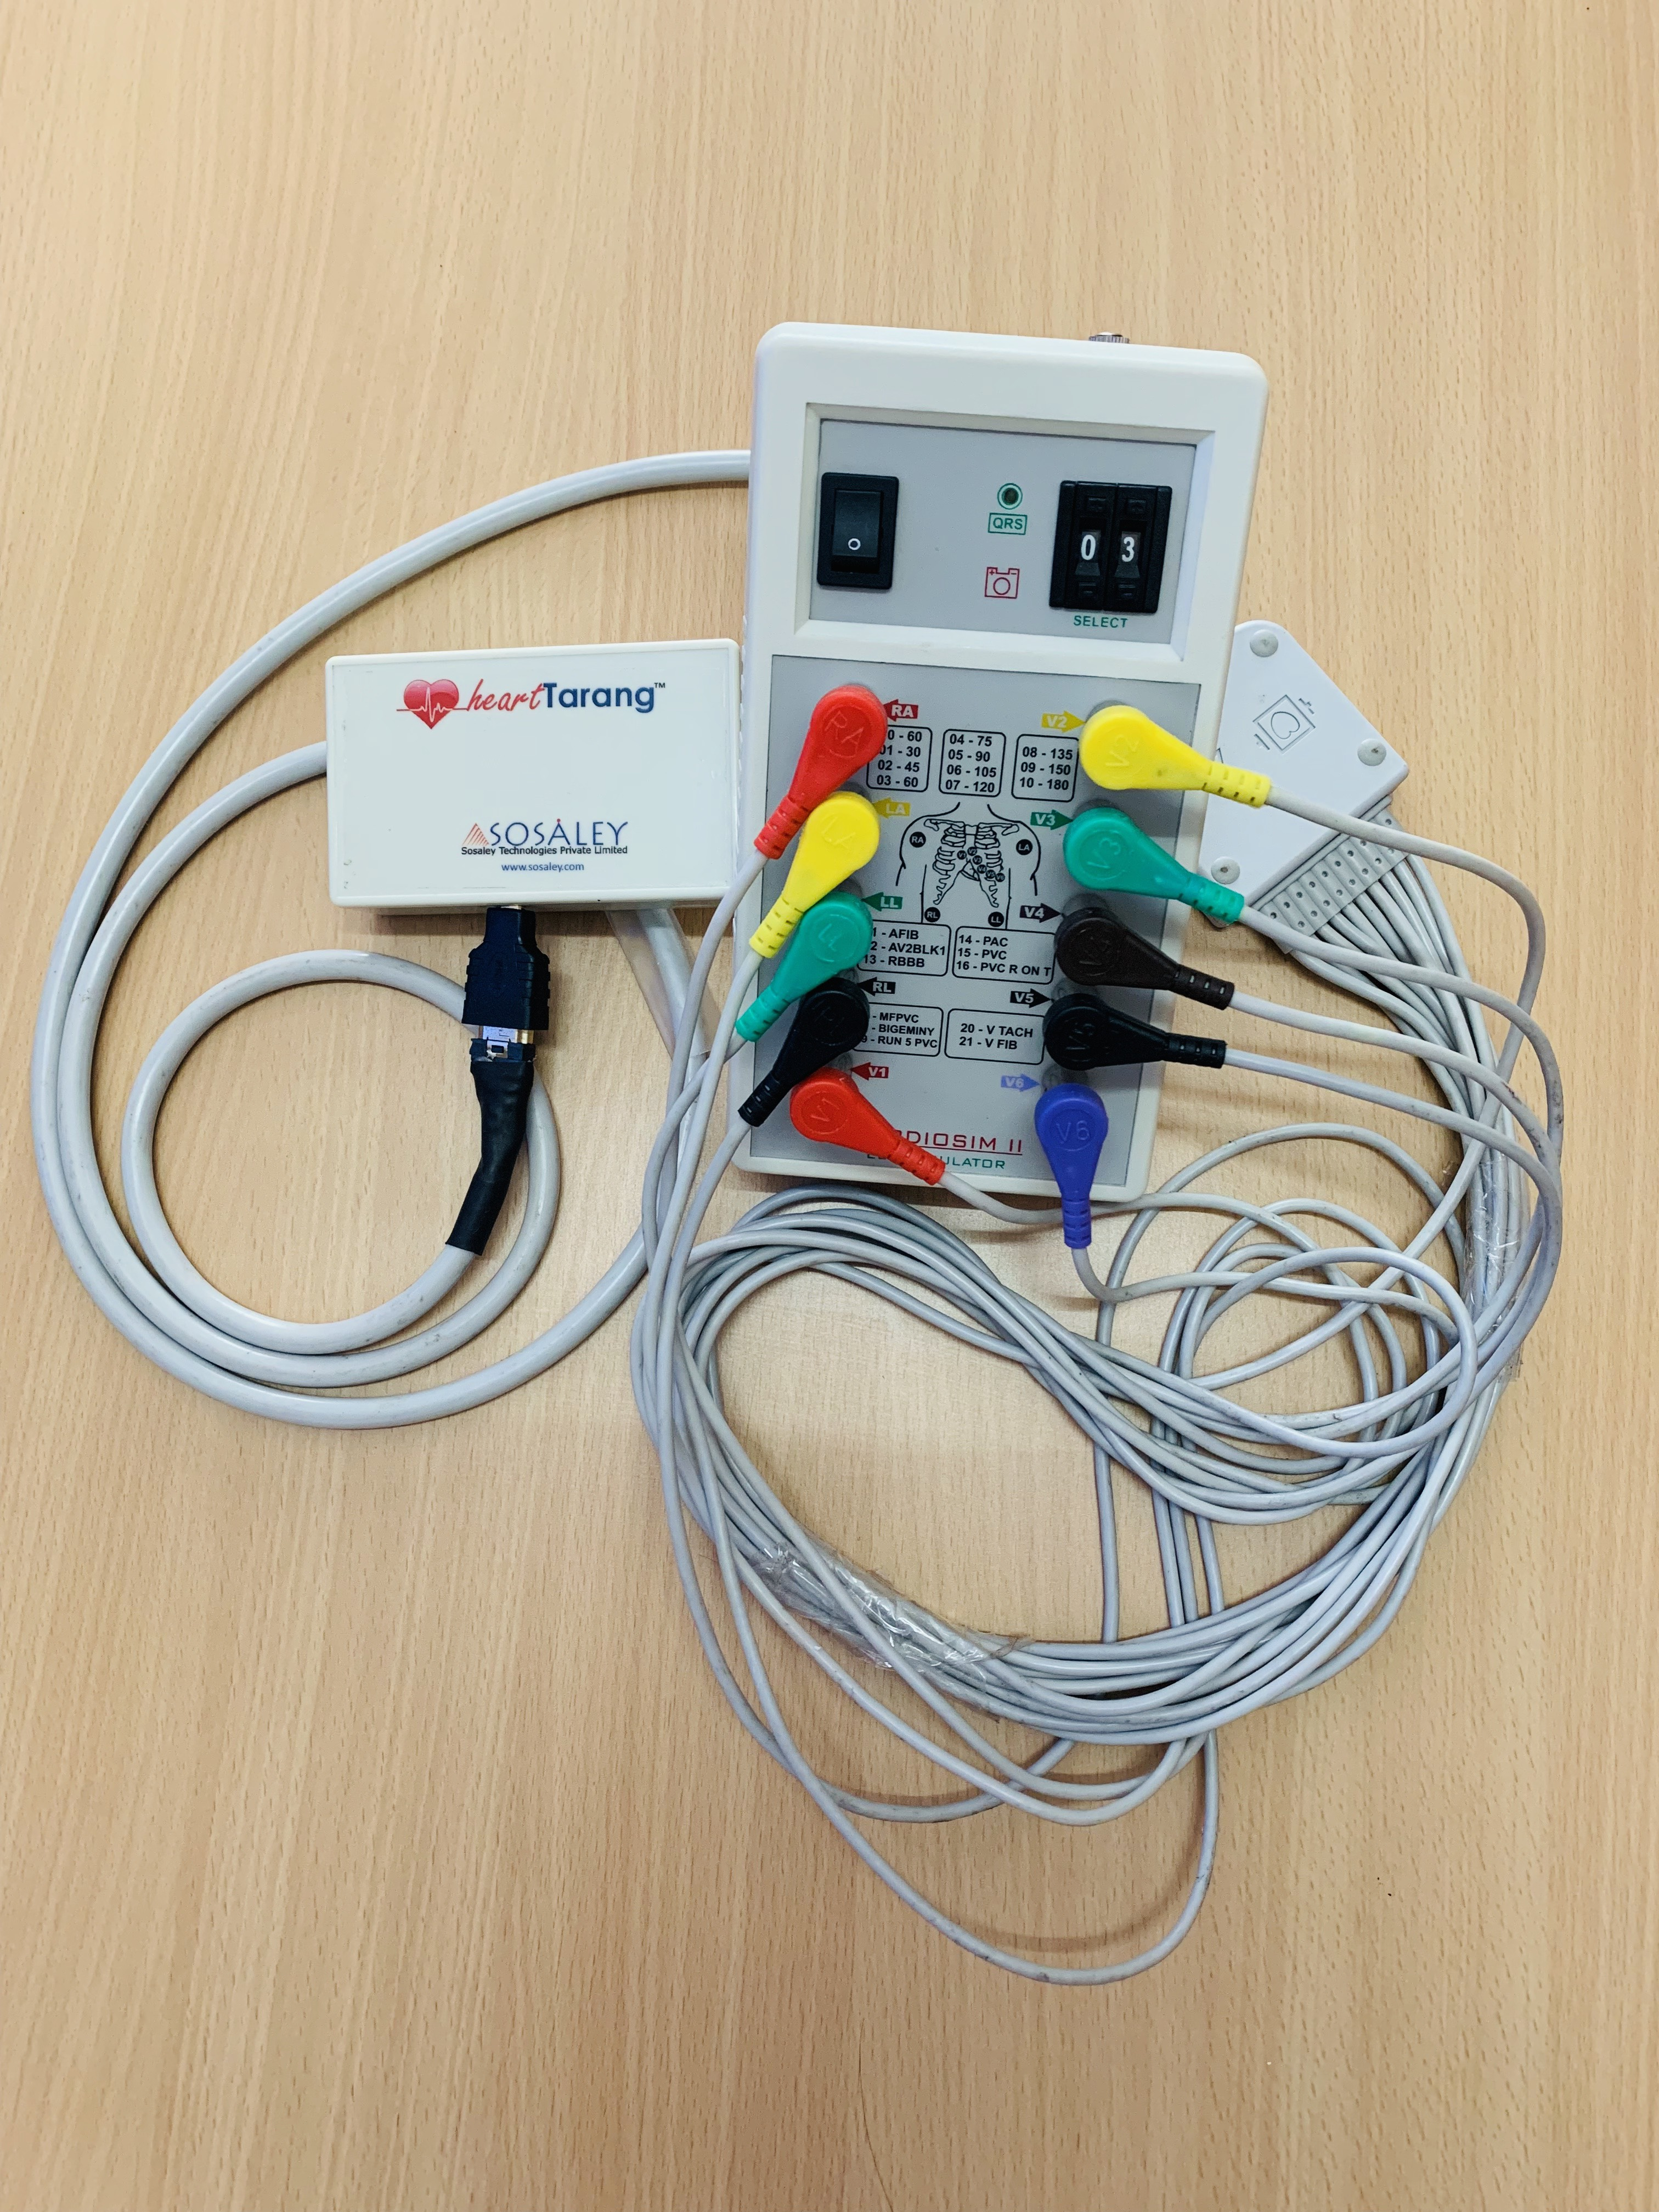 sosaley wireless ecg kit